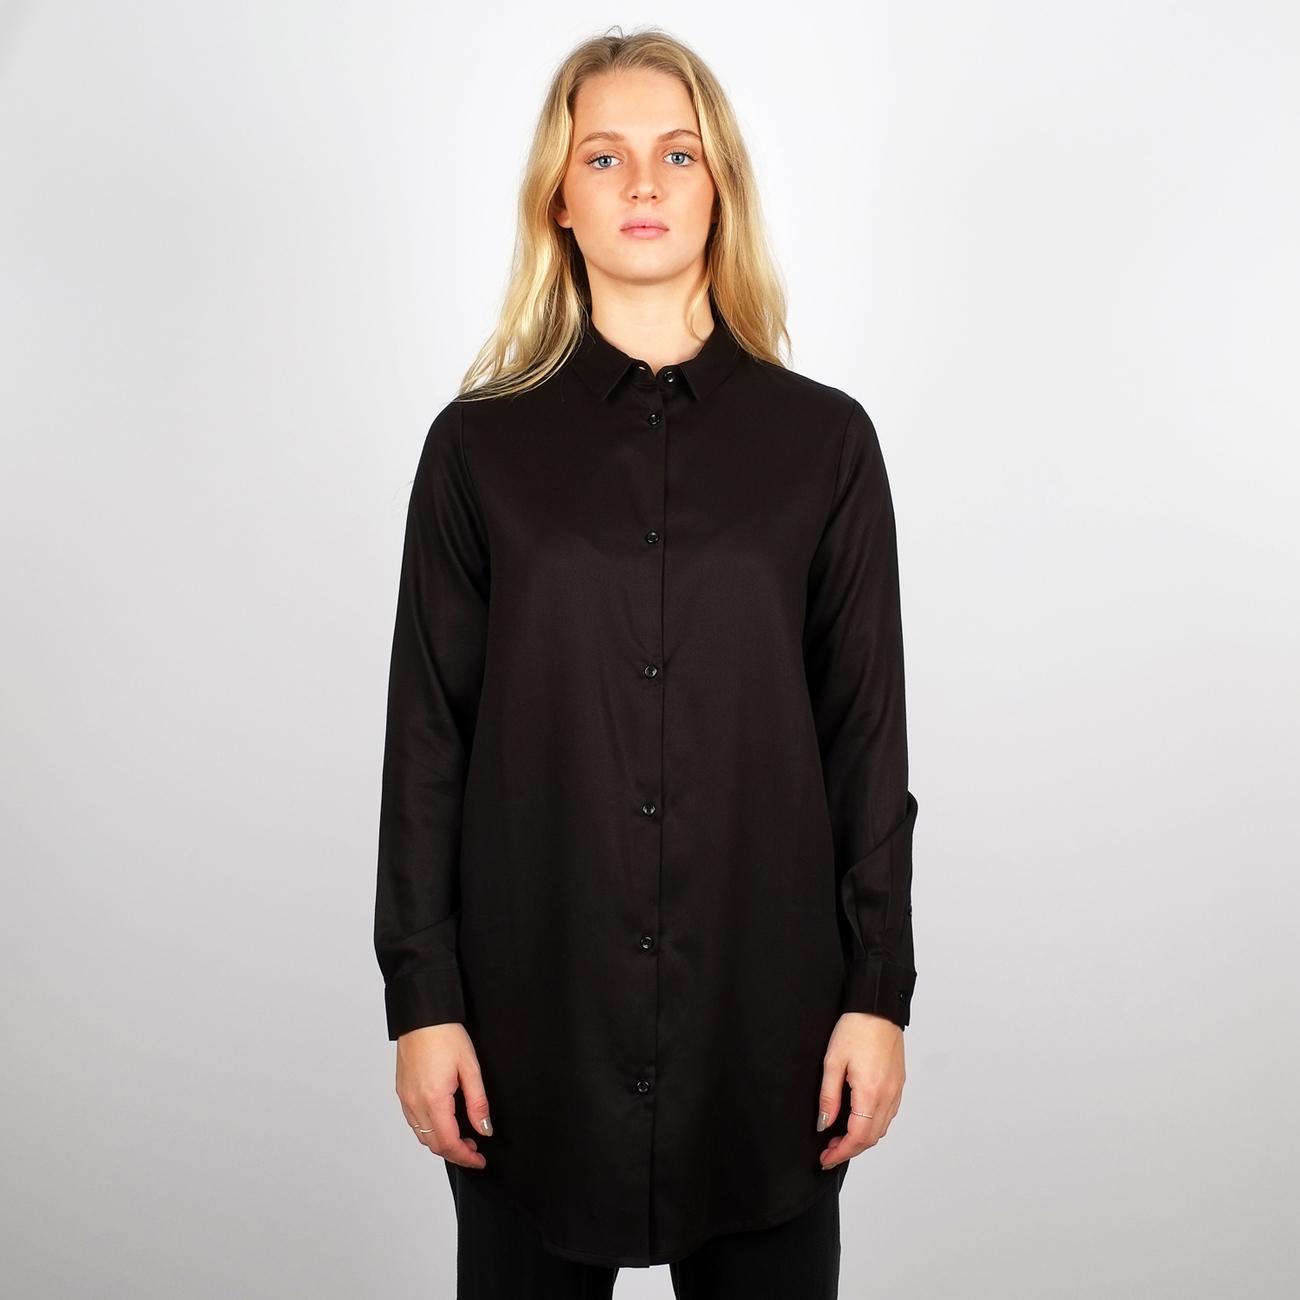 Skjorta Fredericia Svart